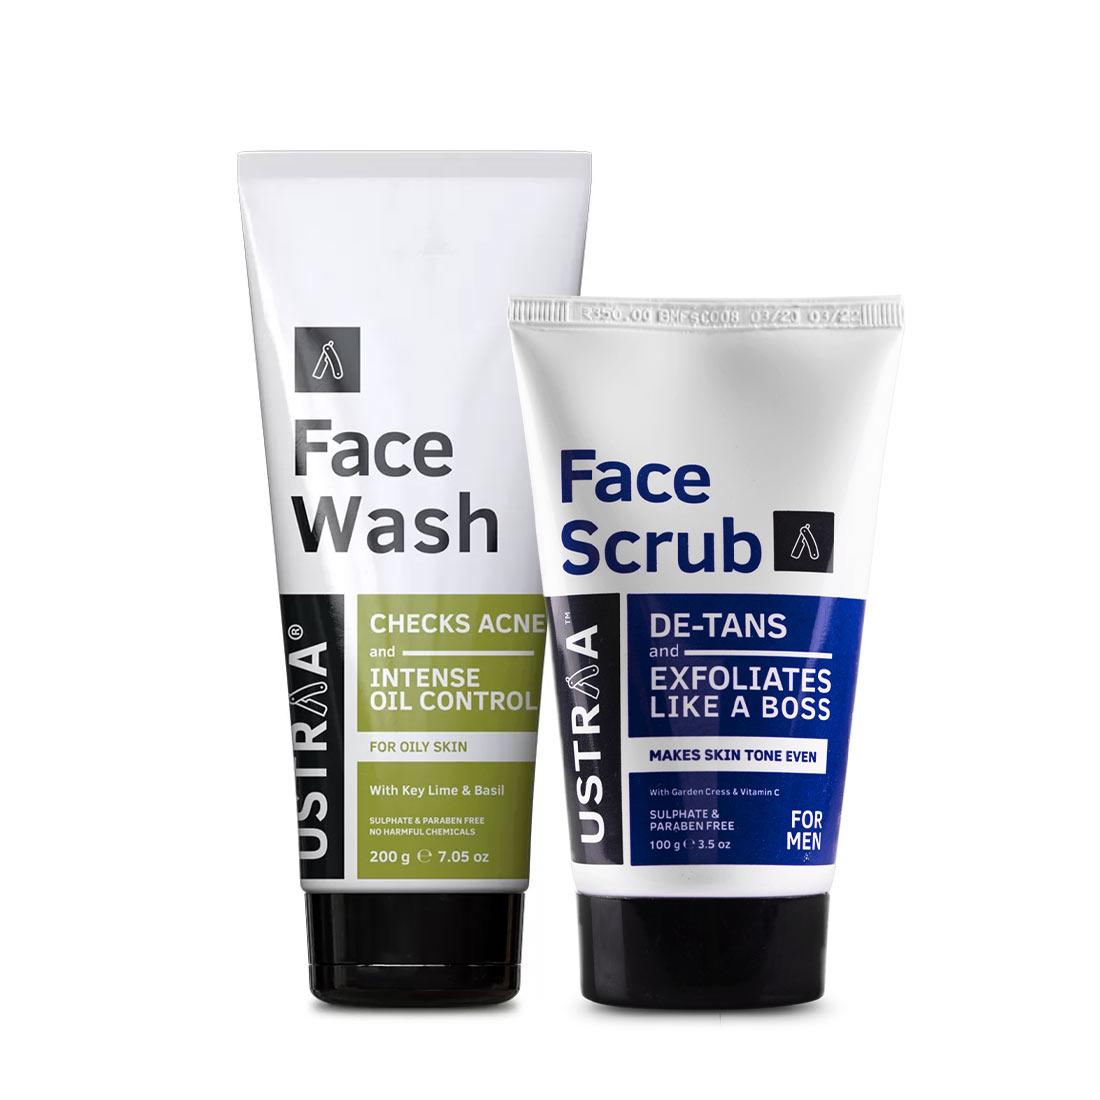 Ustraa | Ustraa Face Wash Oily Skin 200g & De-Tan Face Scrub 100g